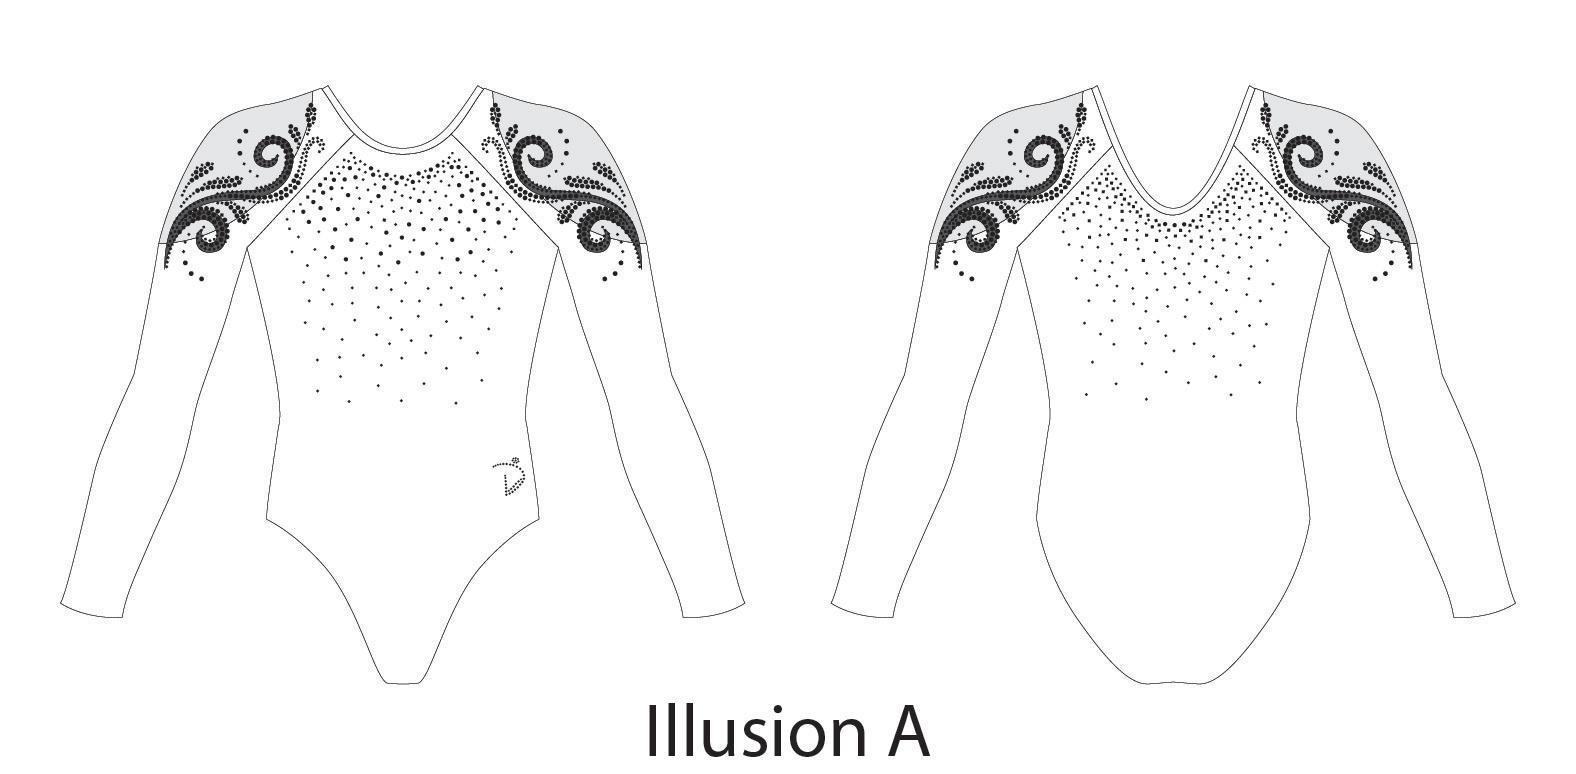 Illusion A